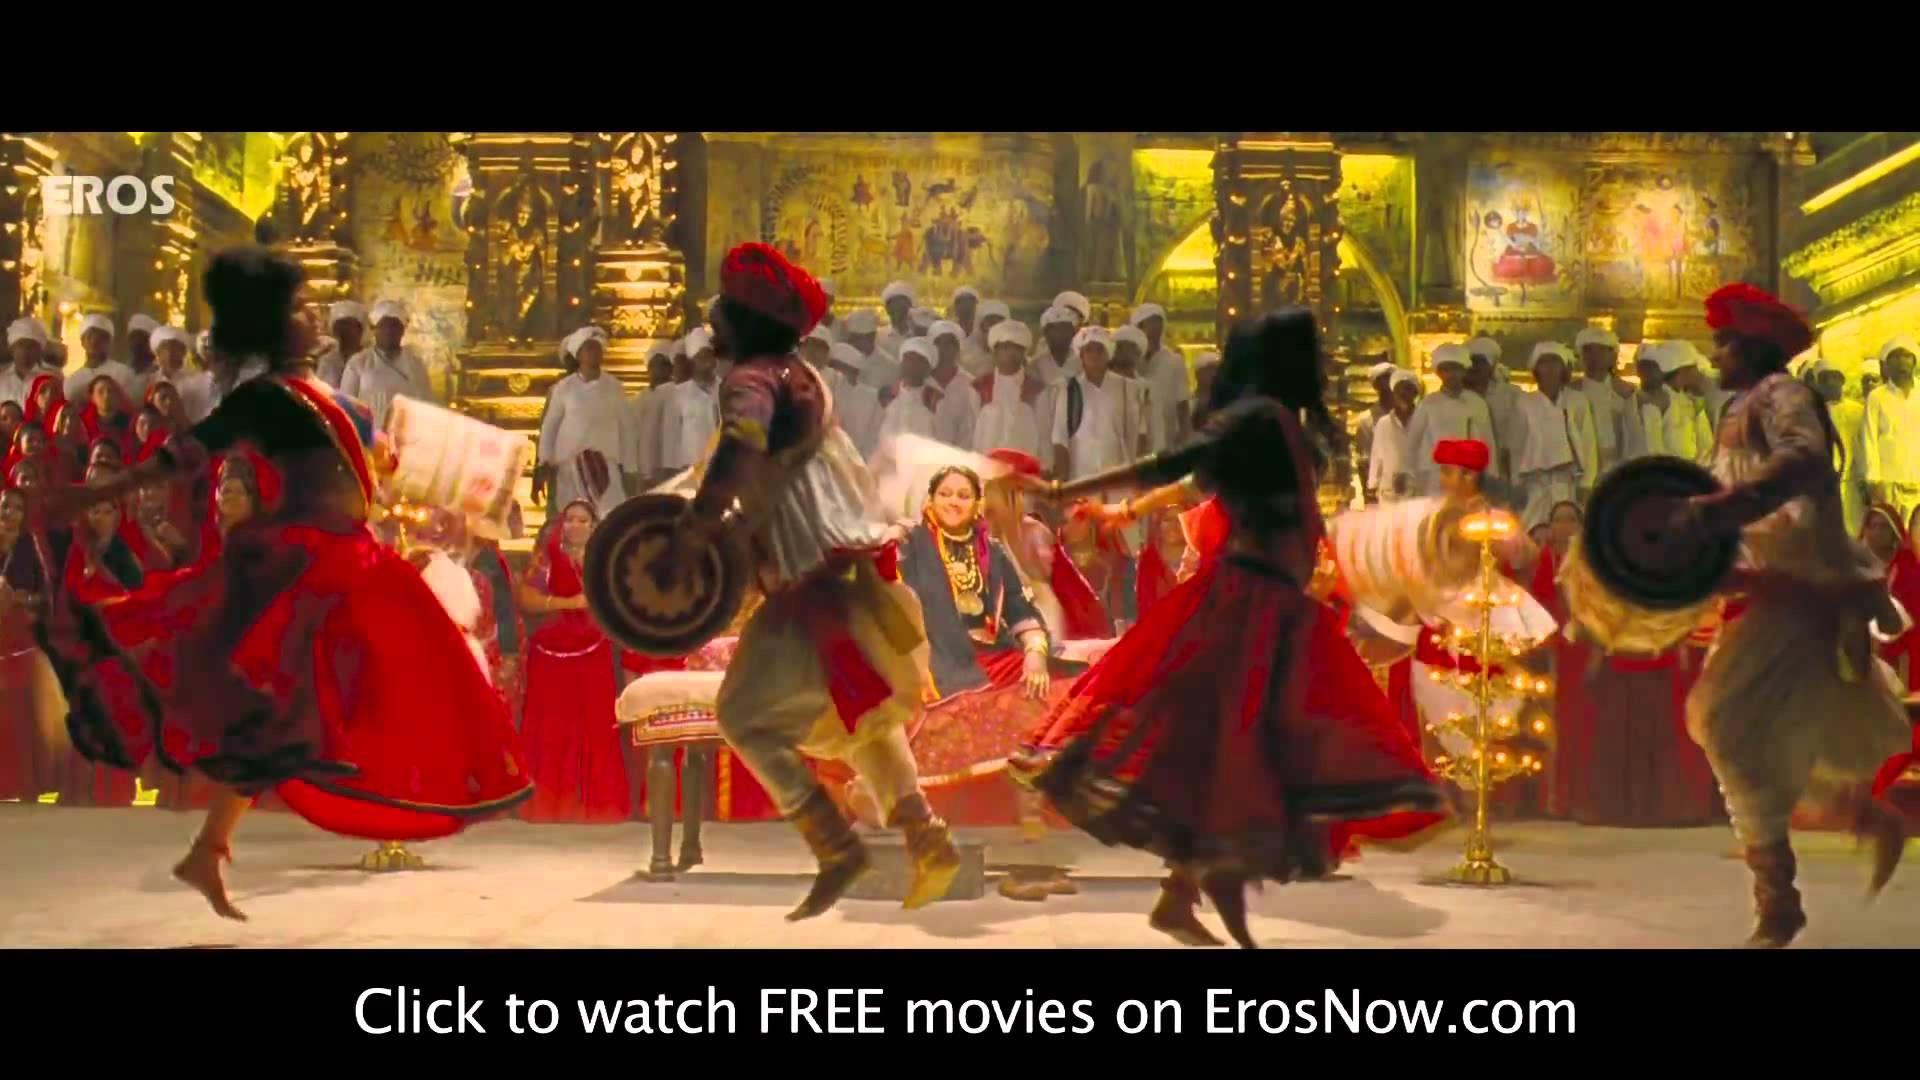 Nagada Sang Dhol Full Song Goliyon Ki Rasleela Ram Leela Mp4 Bollywood Music Videos Songs For Dance Songs